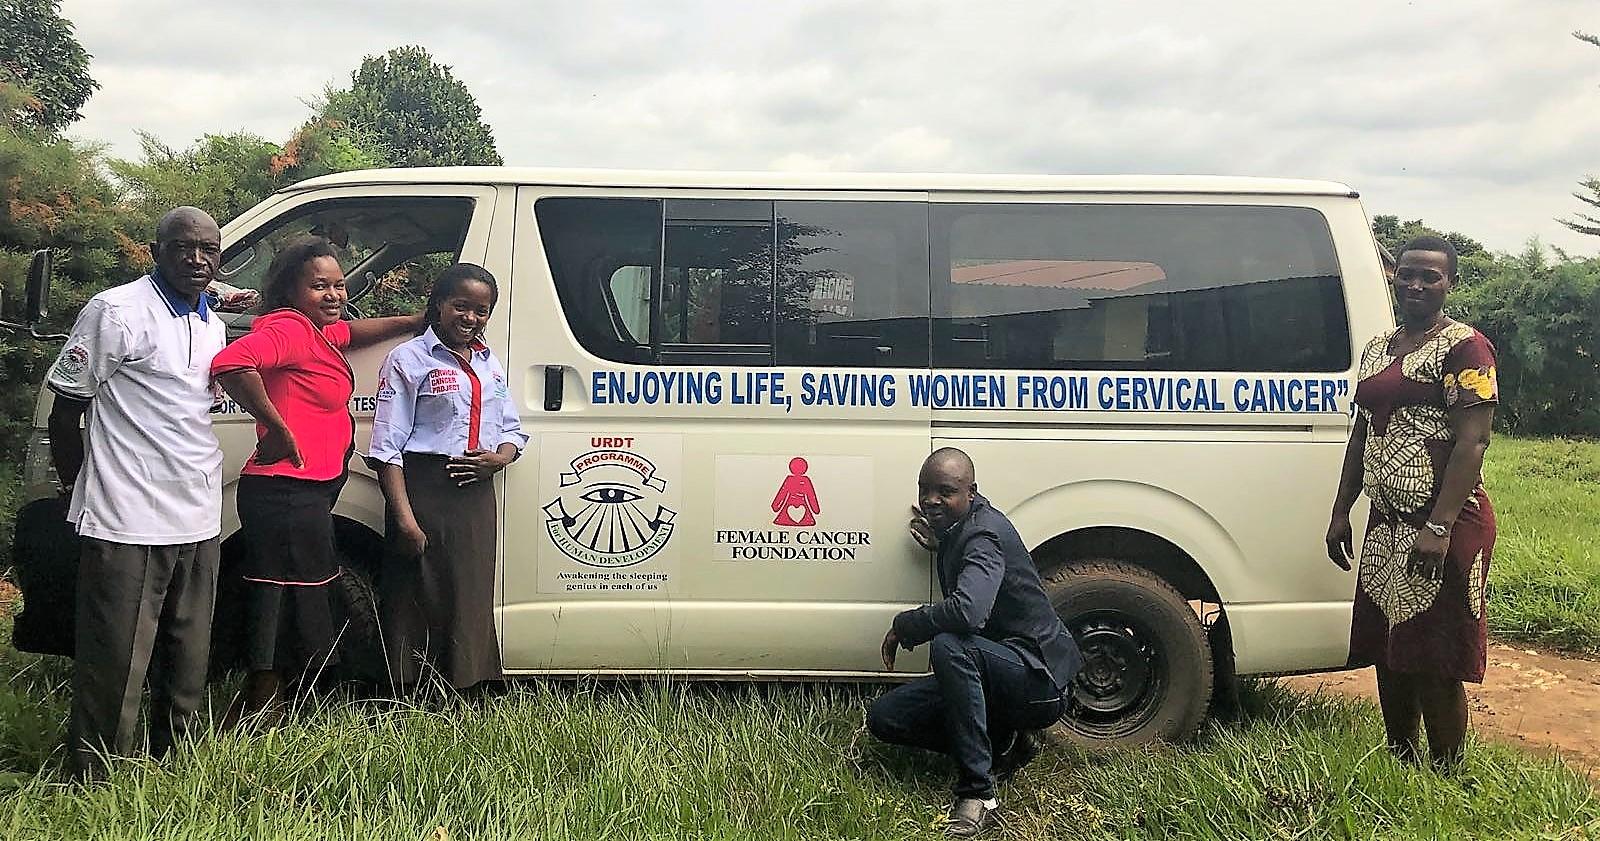 Female Cancer Foundation – A world free of cervical cancer